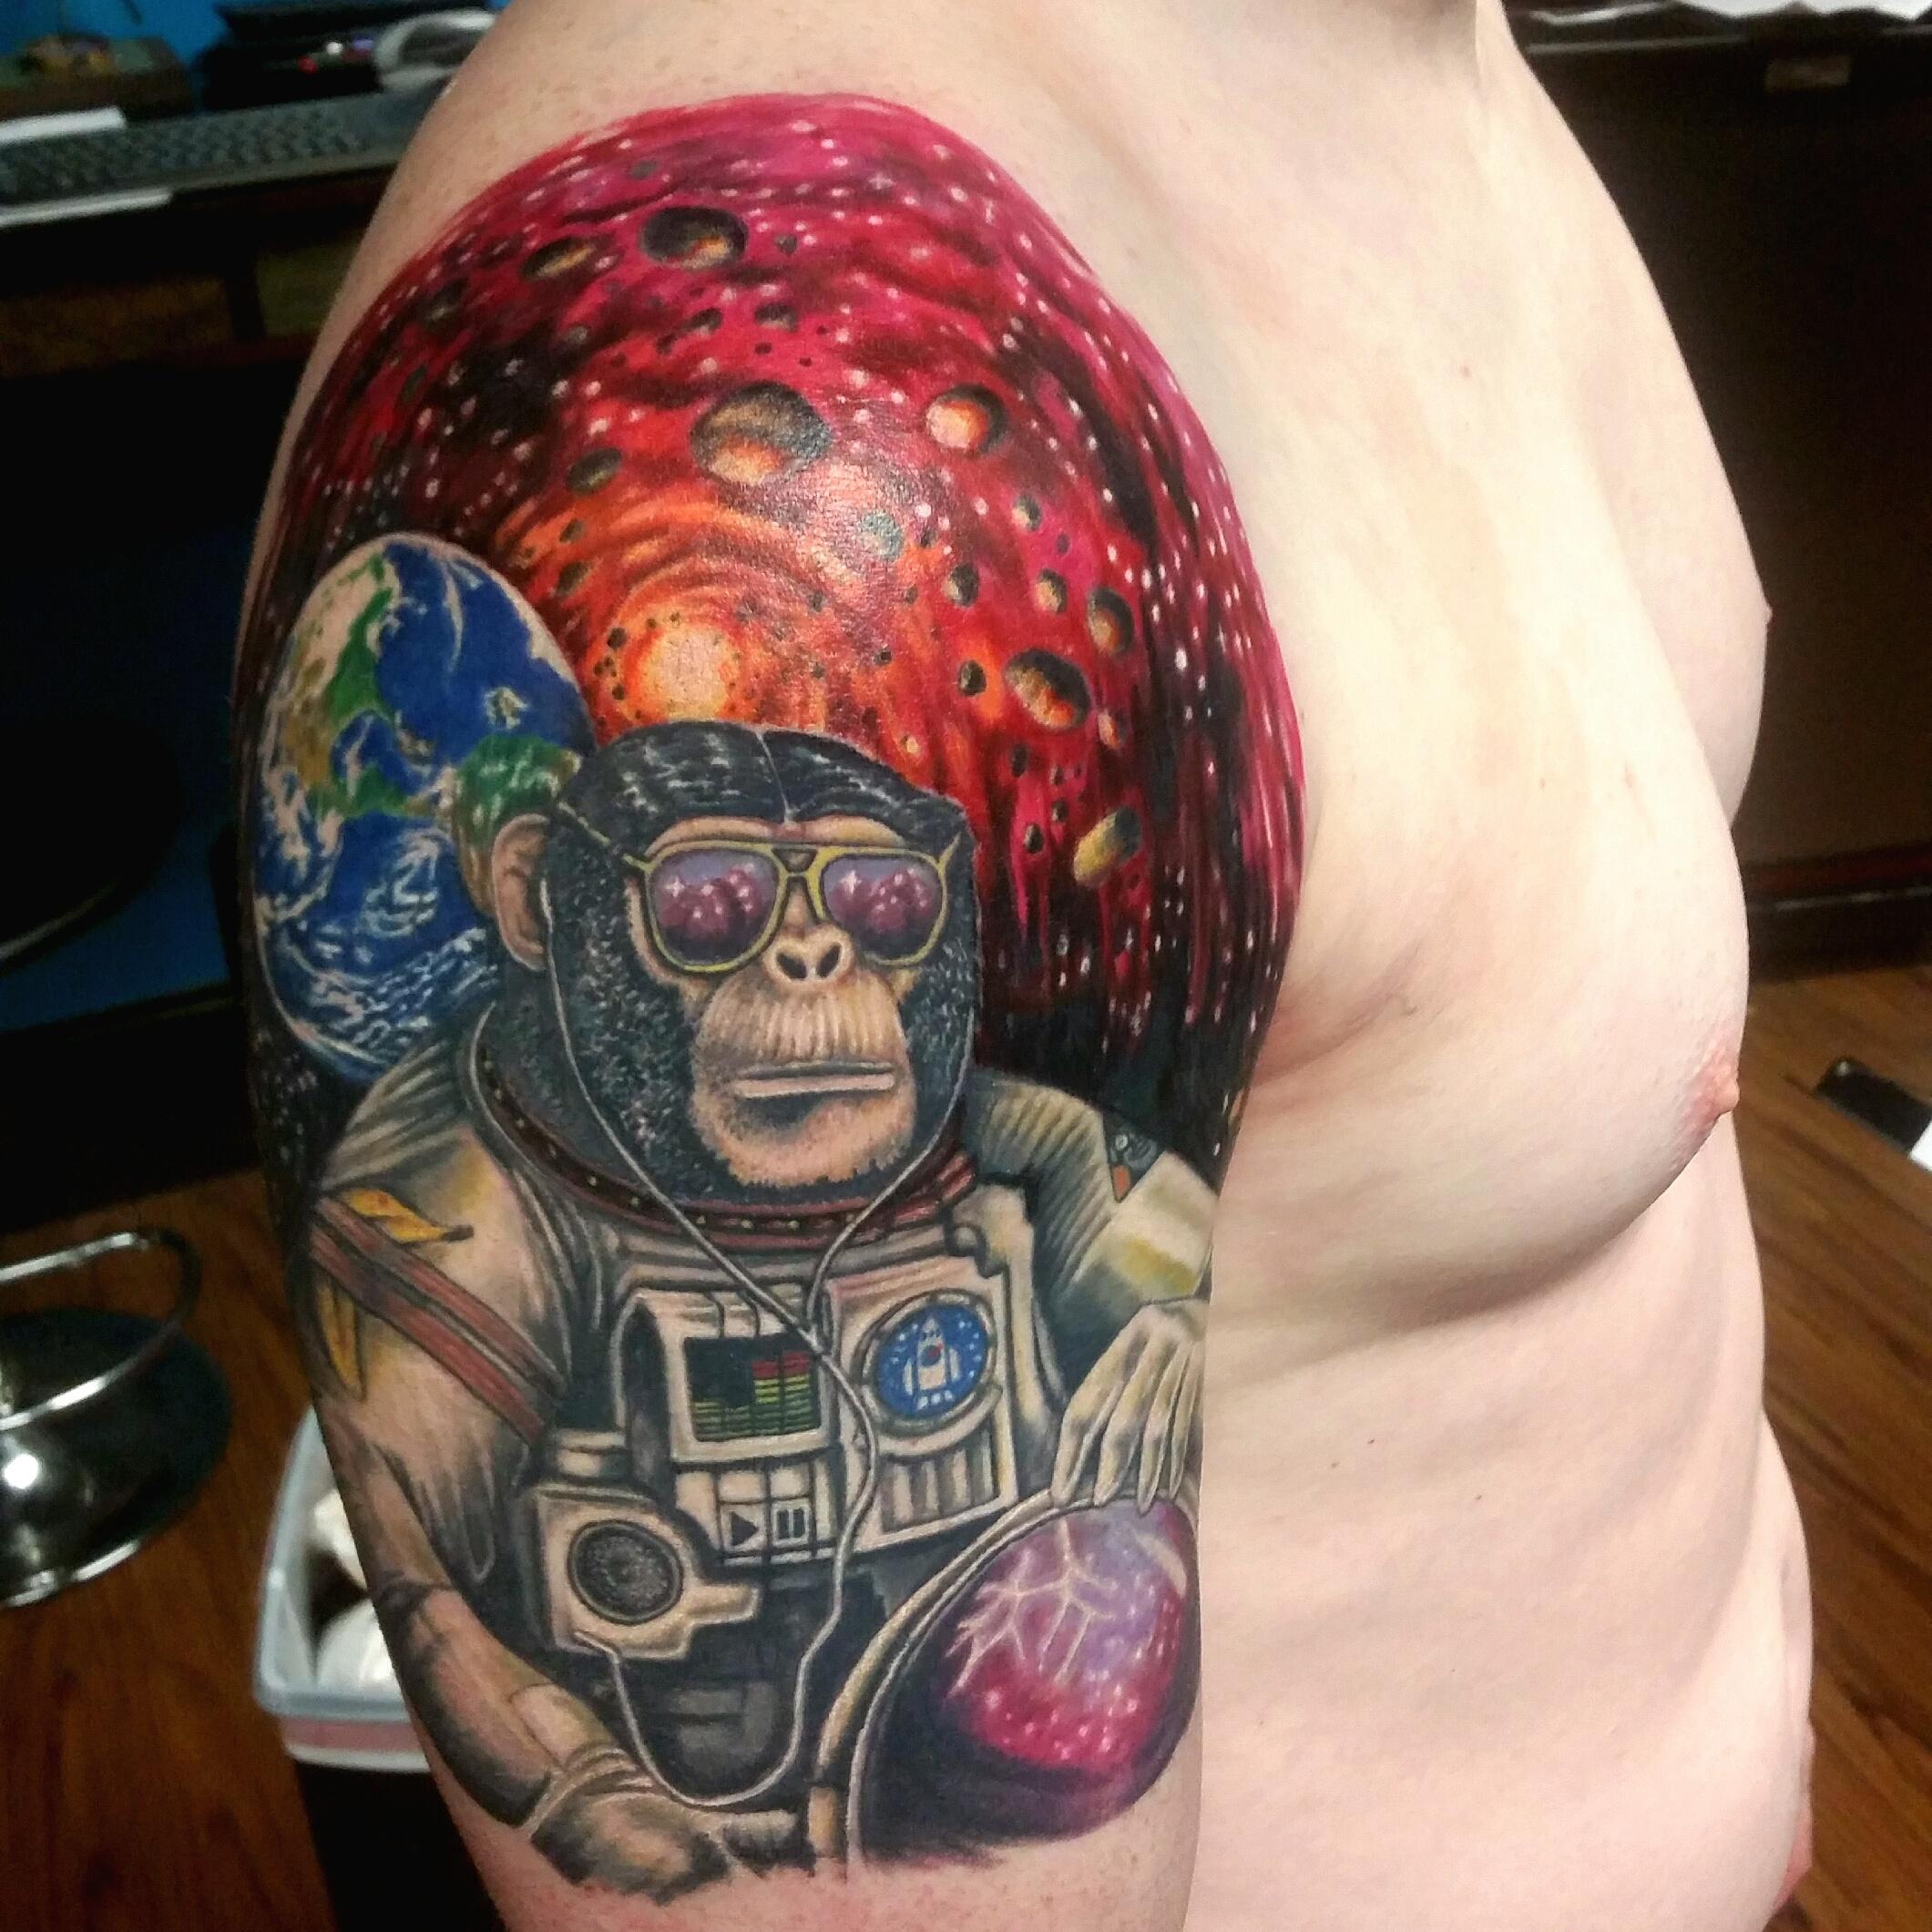 fe8ad54c5 Space Monkey Tattoo - Headless Hands Custom Tattoos